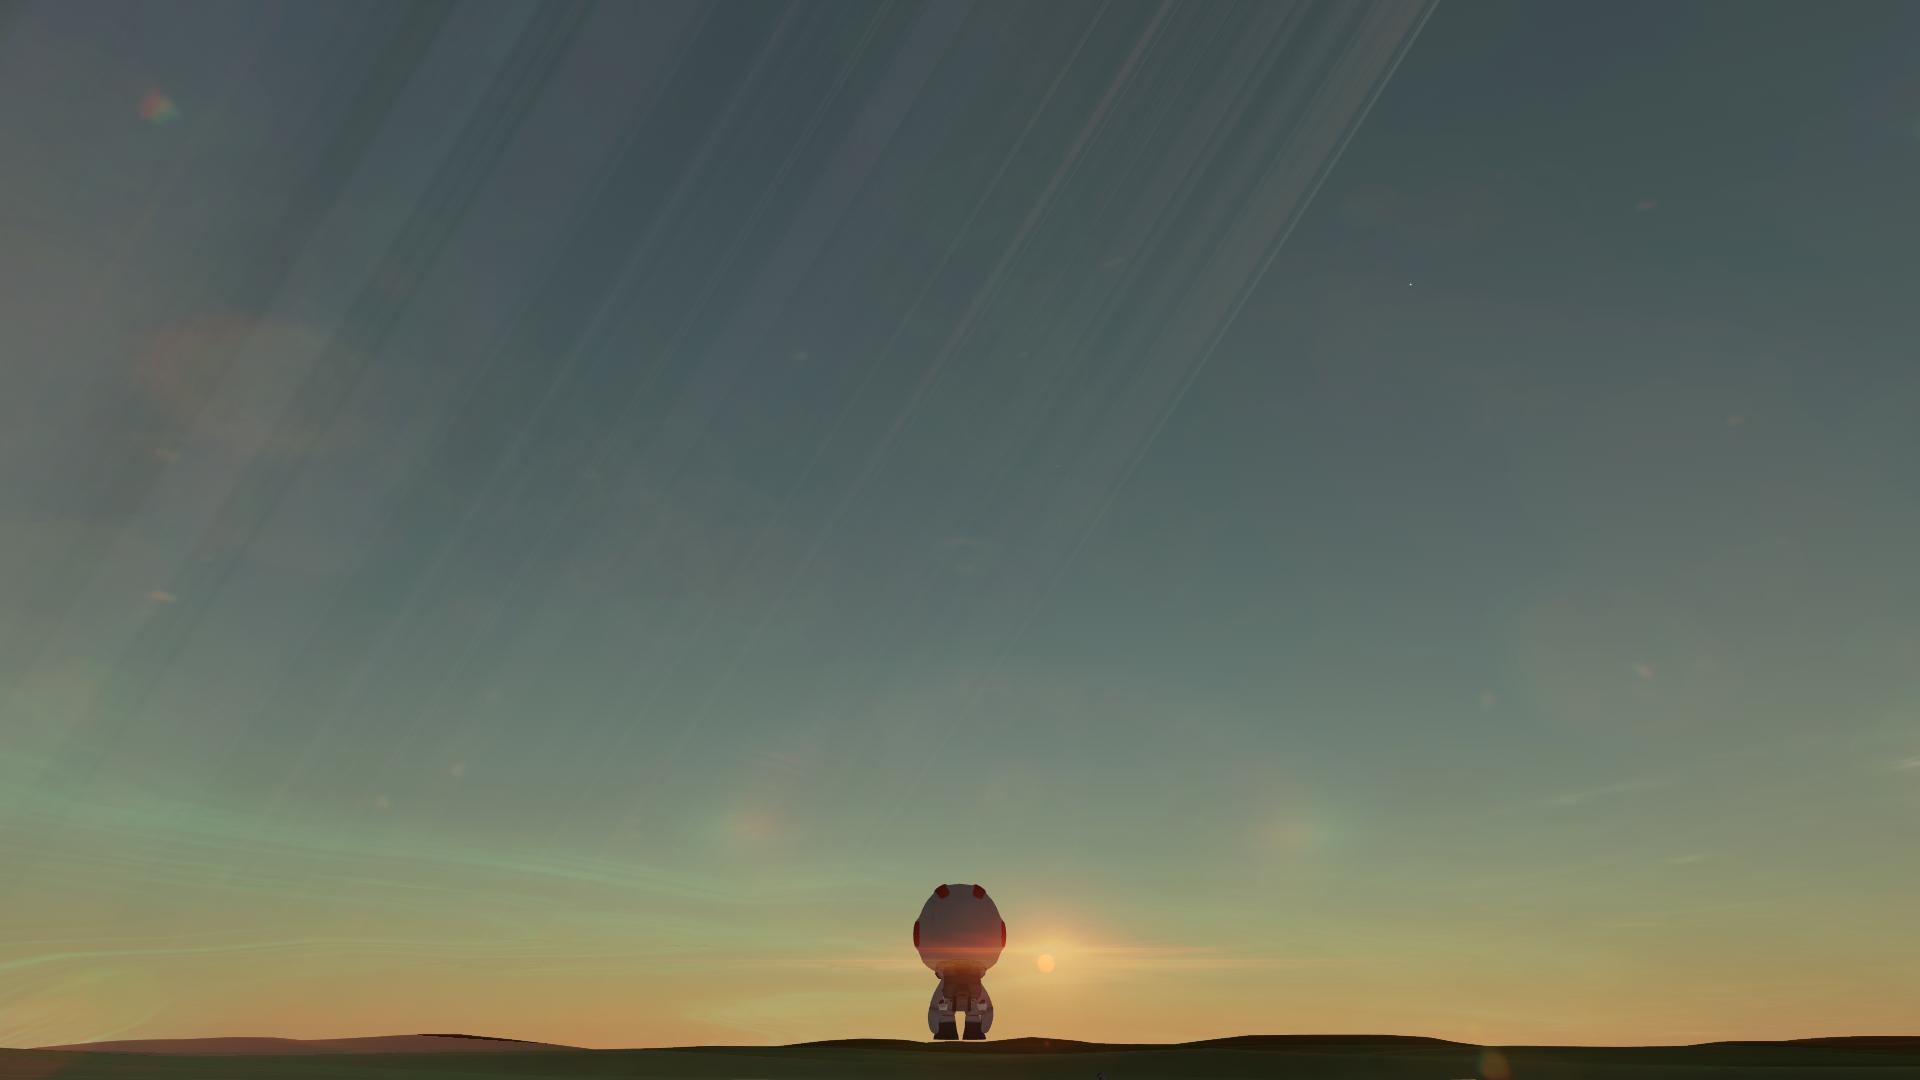 GitHub - TheProtagonists/TheWorldBeyond: Kopernicus based KSP planet